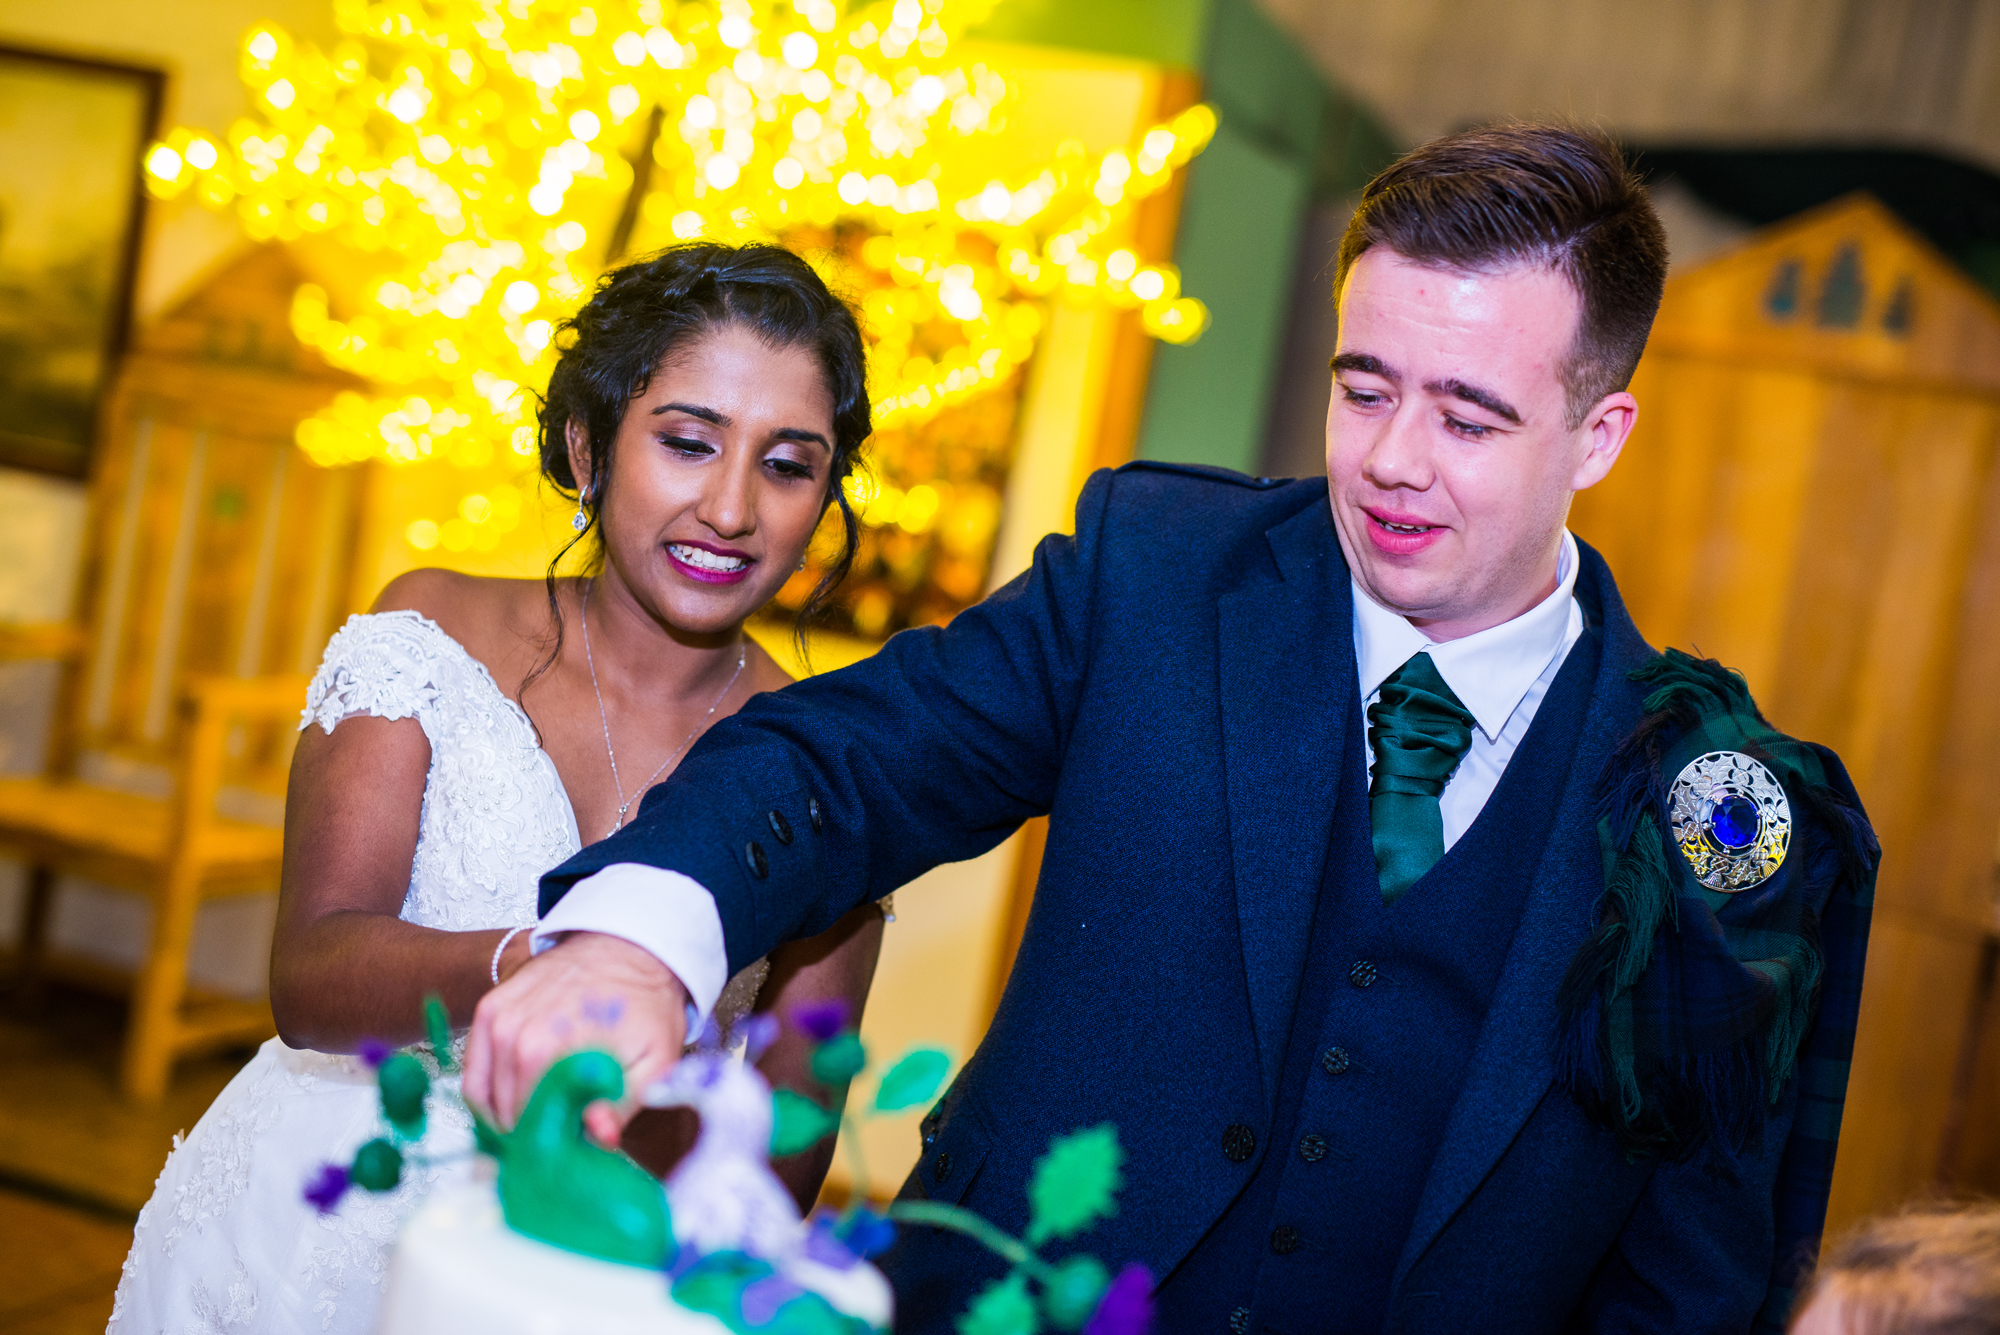 Kev and Shrabani wedding photos (316 of 350).jpg